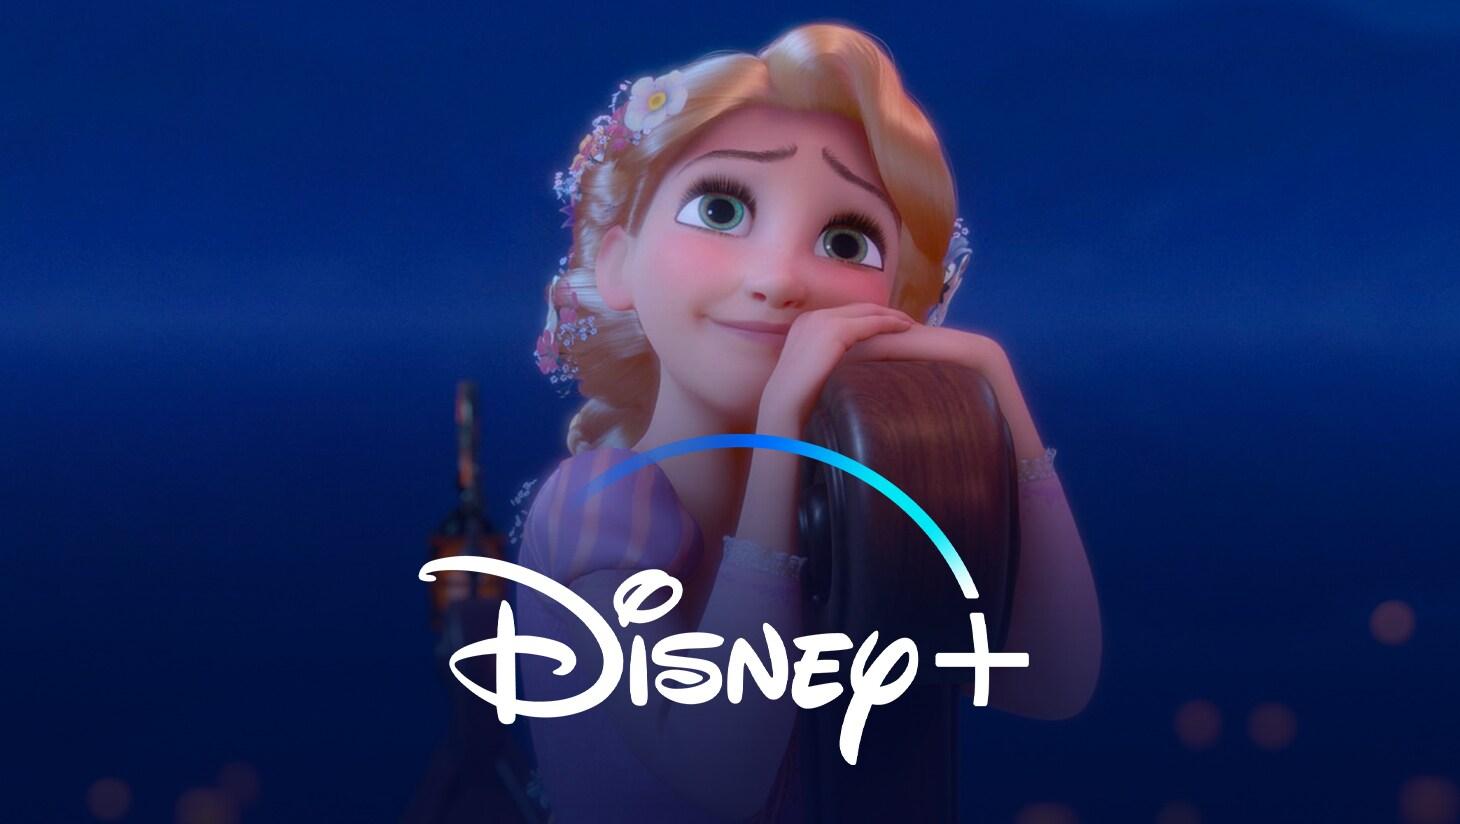 Tangled - Disney+